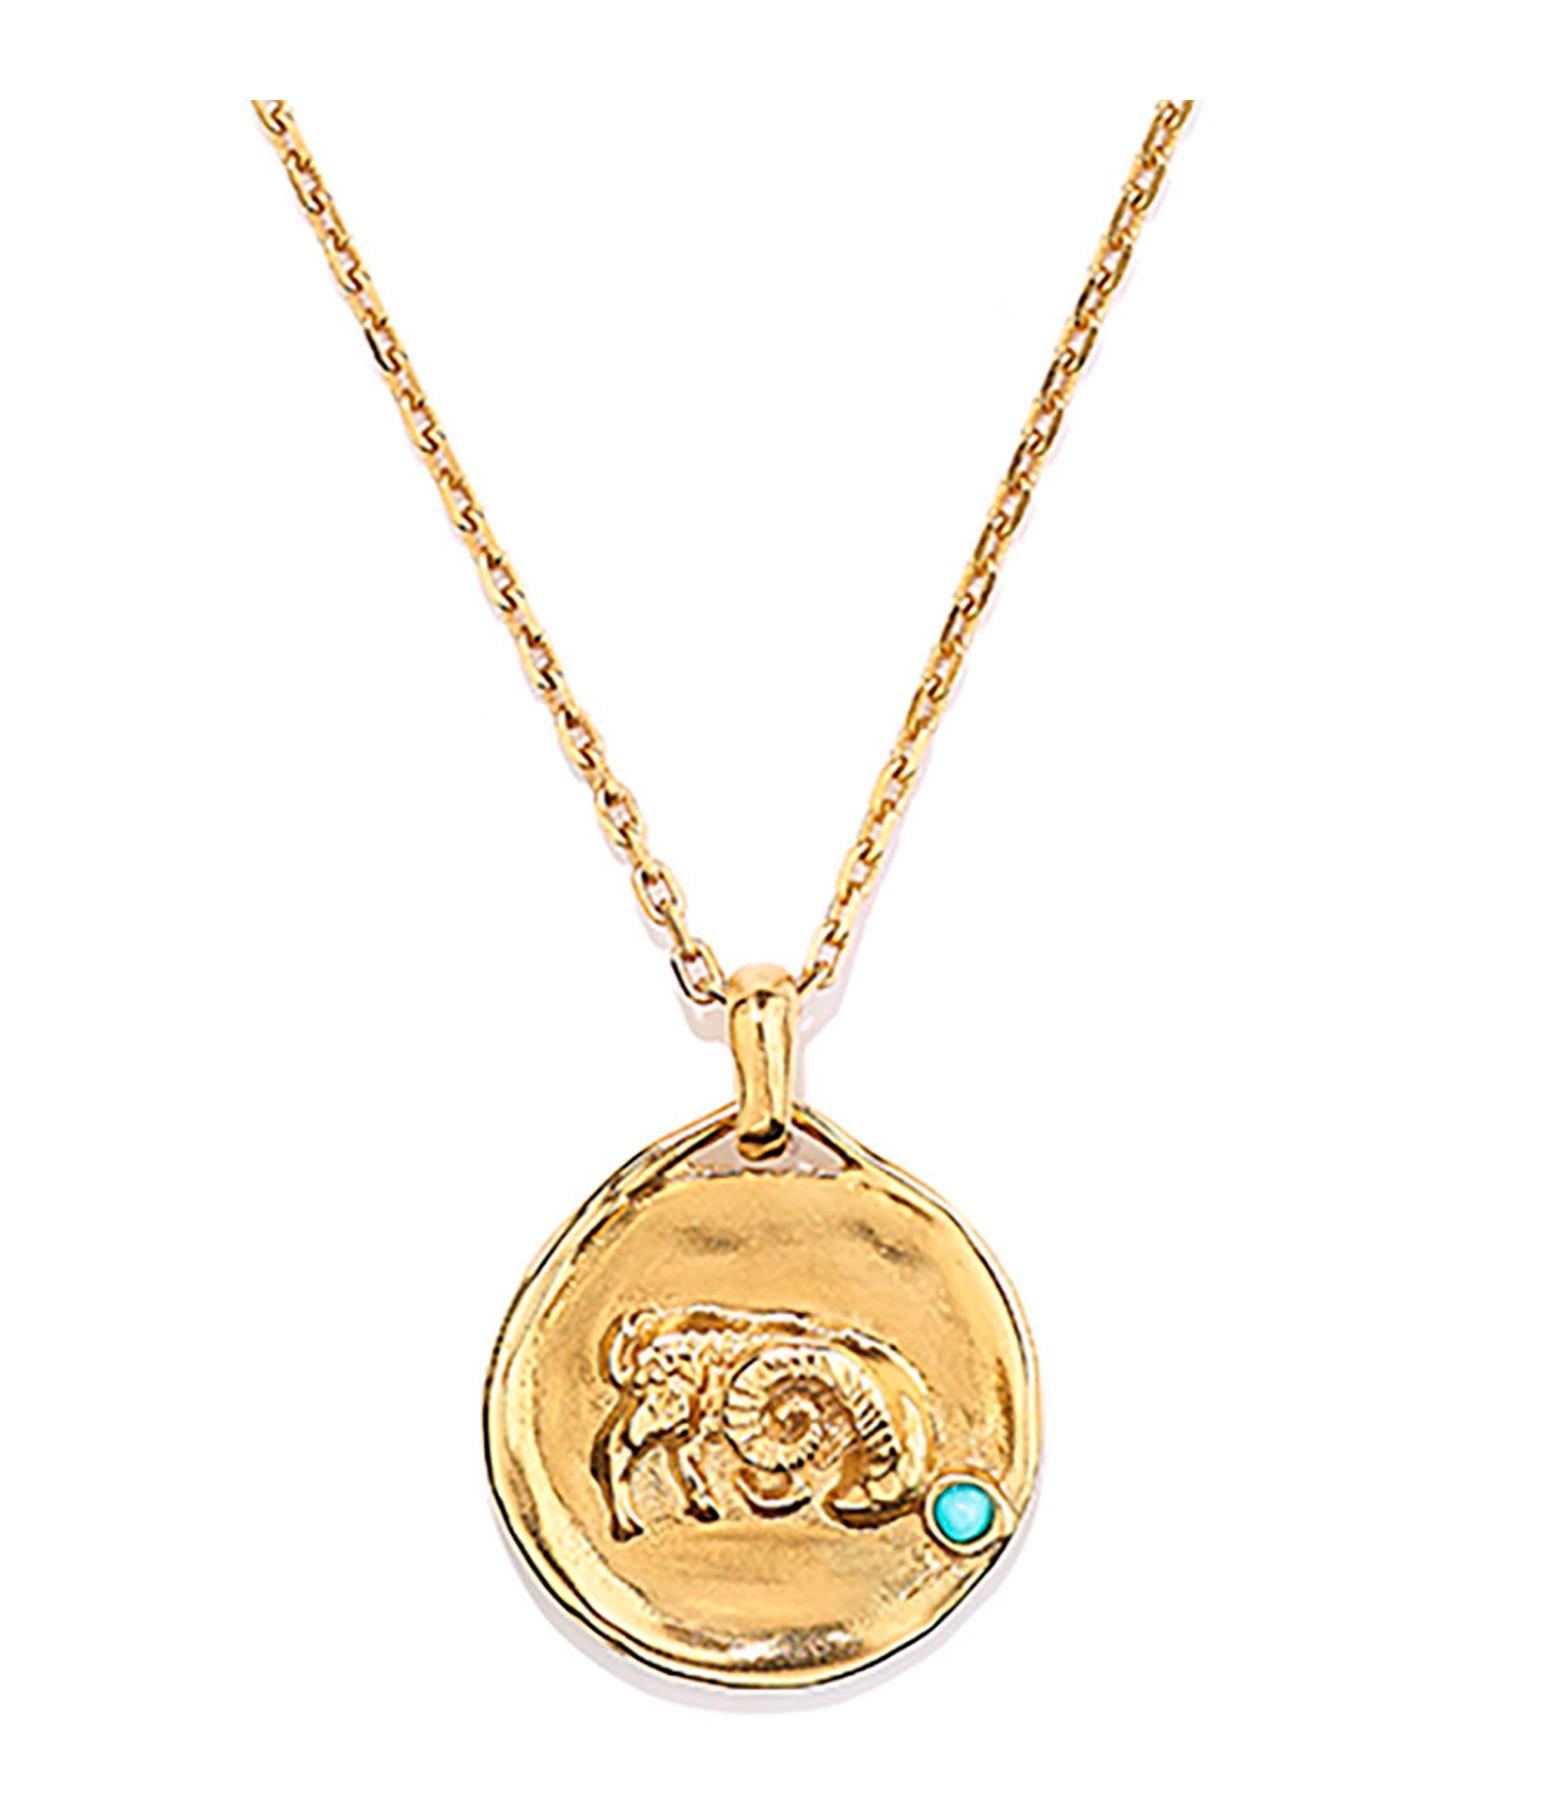 GOOSSENS - Collier Talisman Mini Astro Capricorne Turquoise Plaqué Or